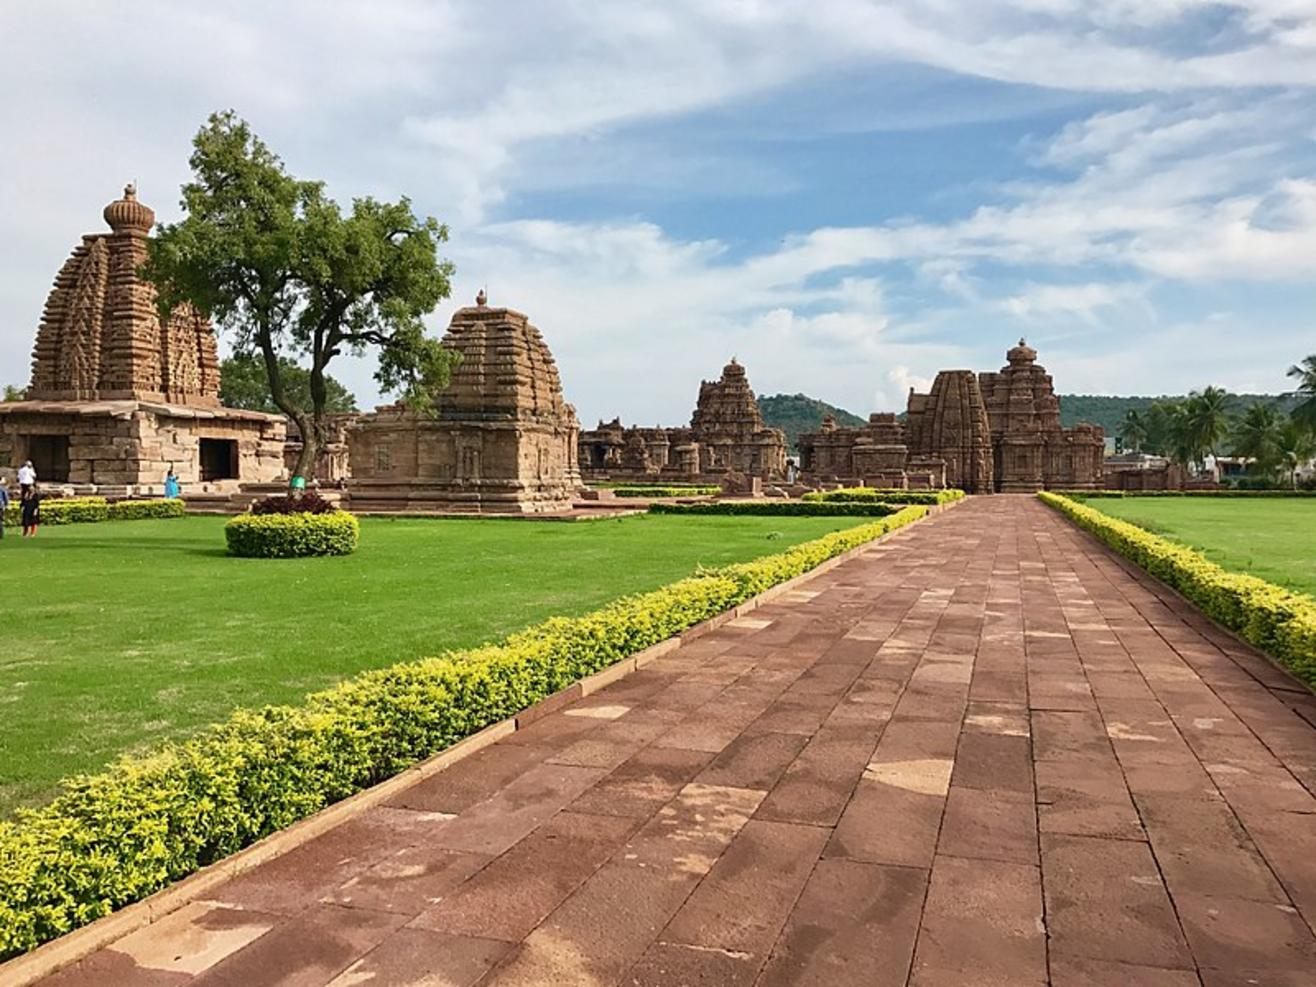 Group of Monuments, Pattadakal